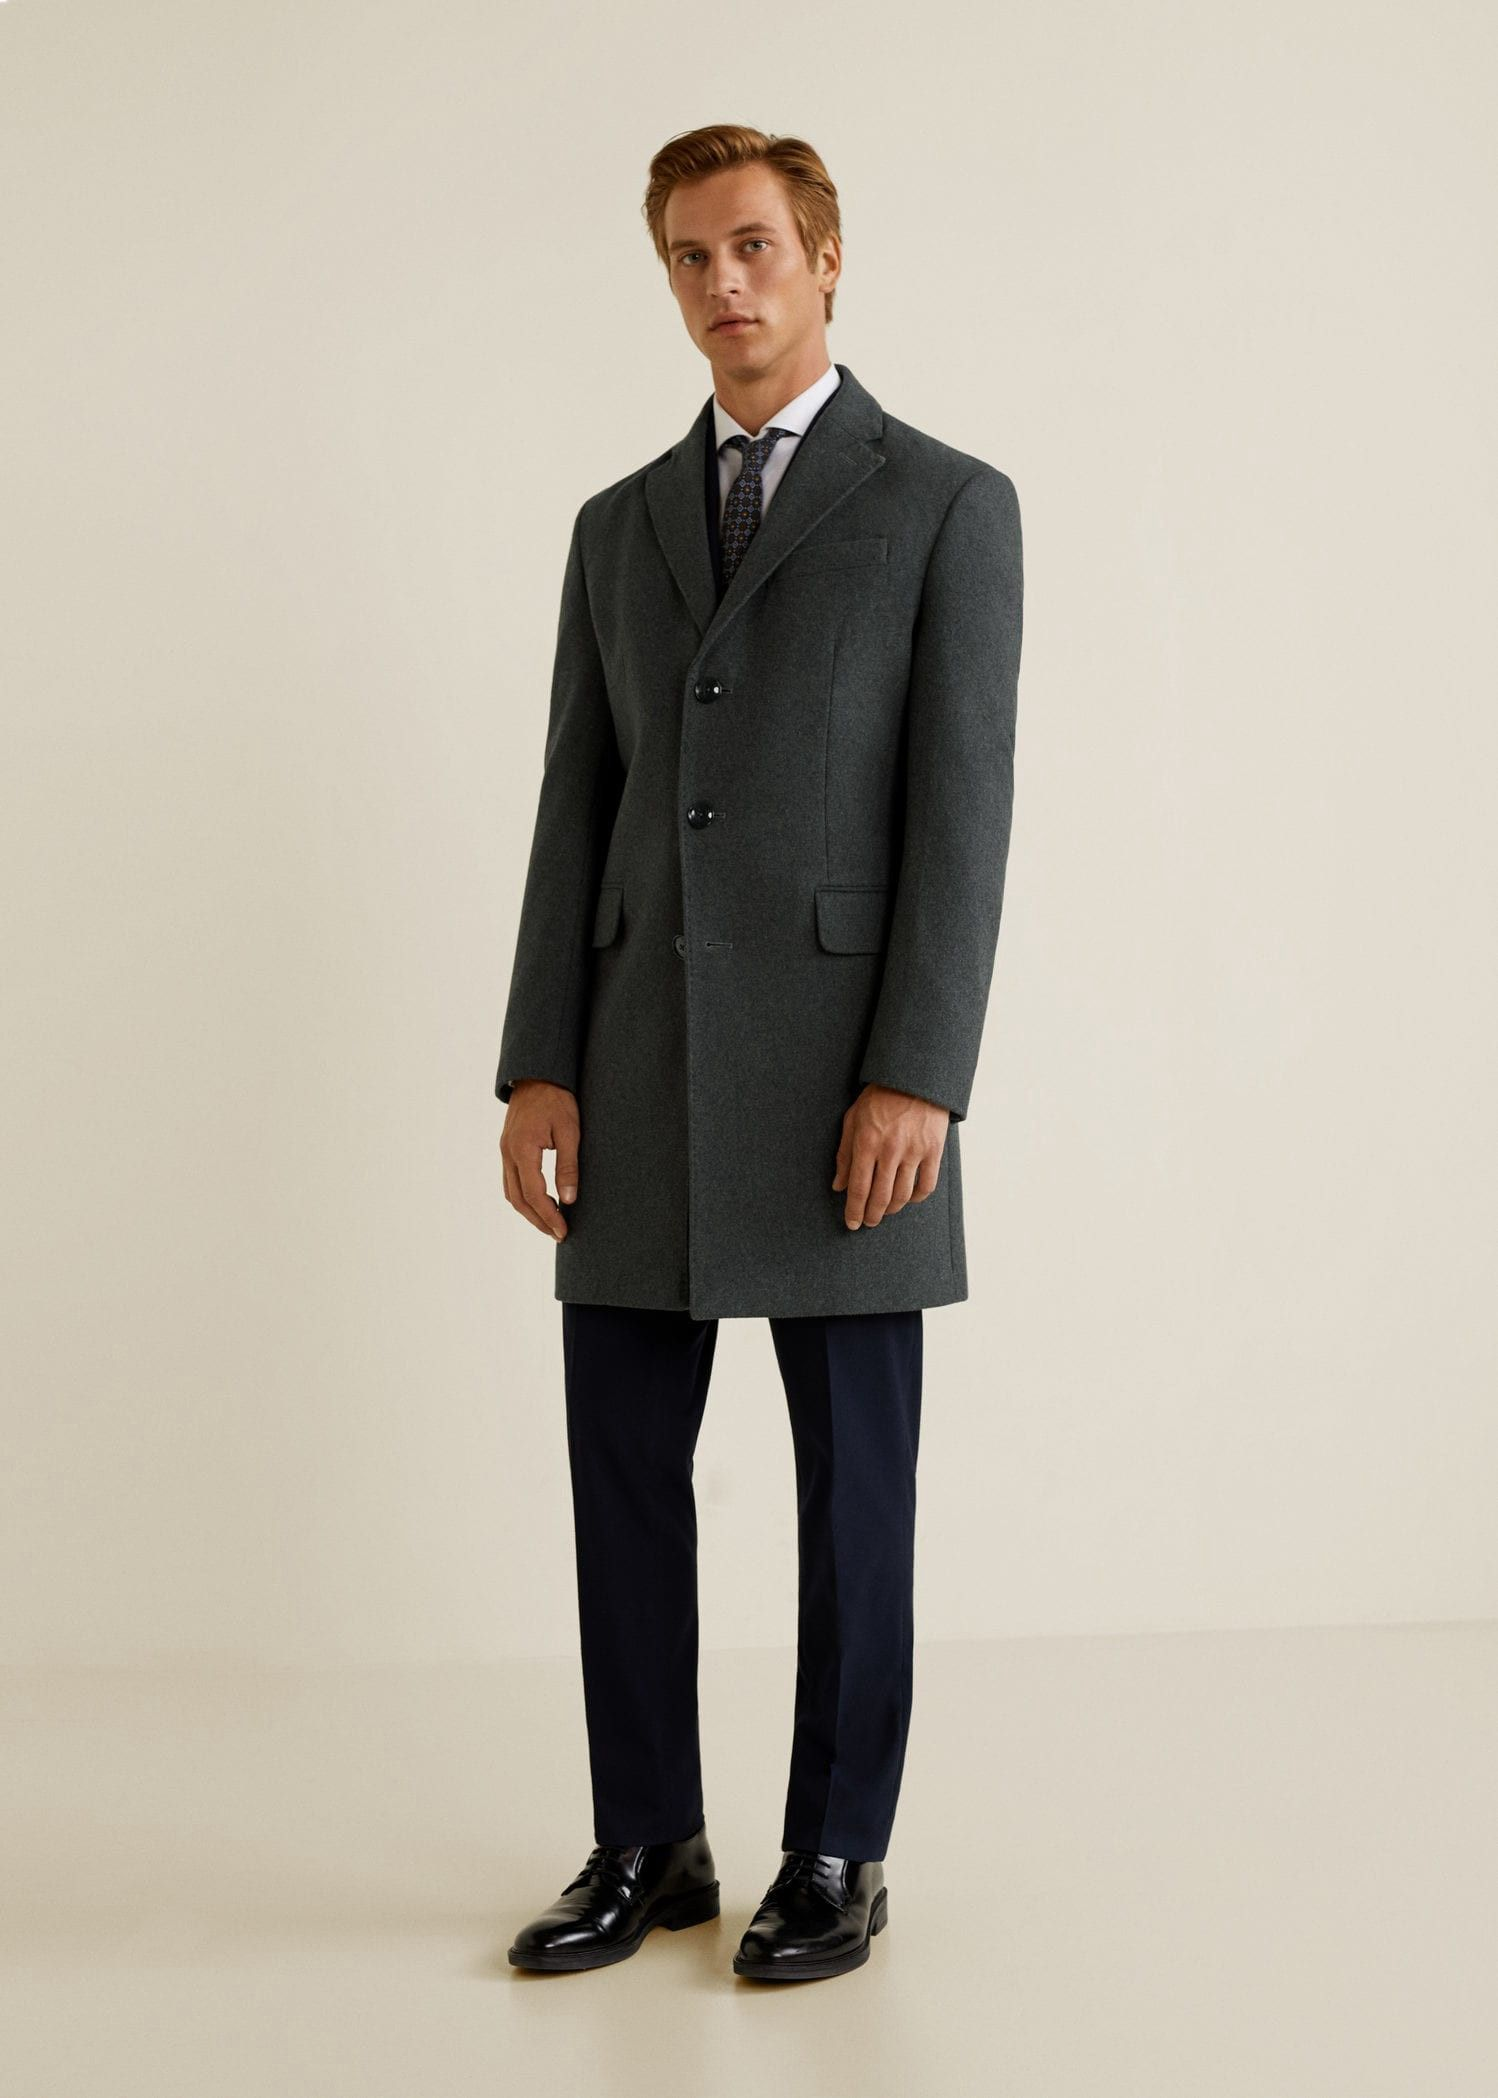 7c0ea0c6f30b3 Classic wool Tailored coat by Mango   Products   Pinterest ...